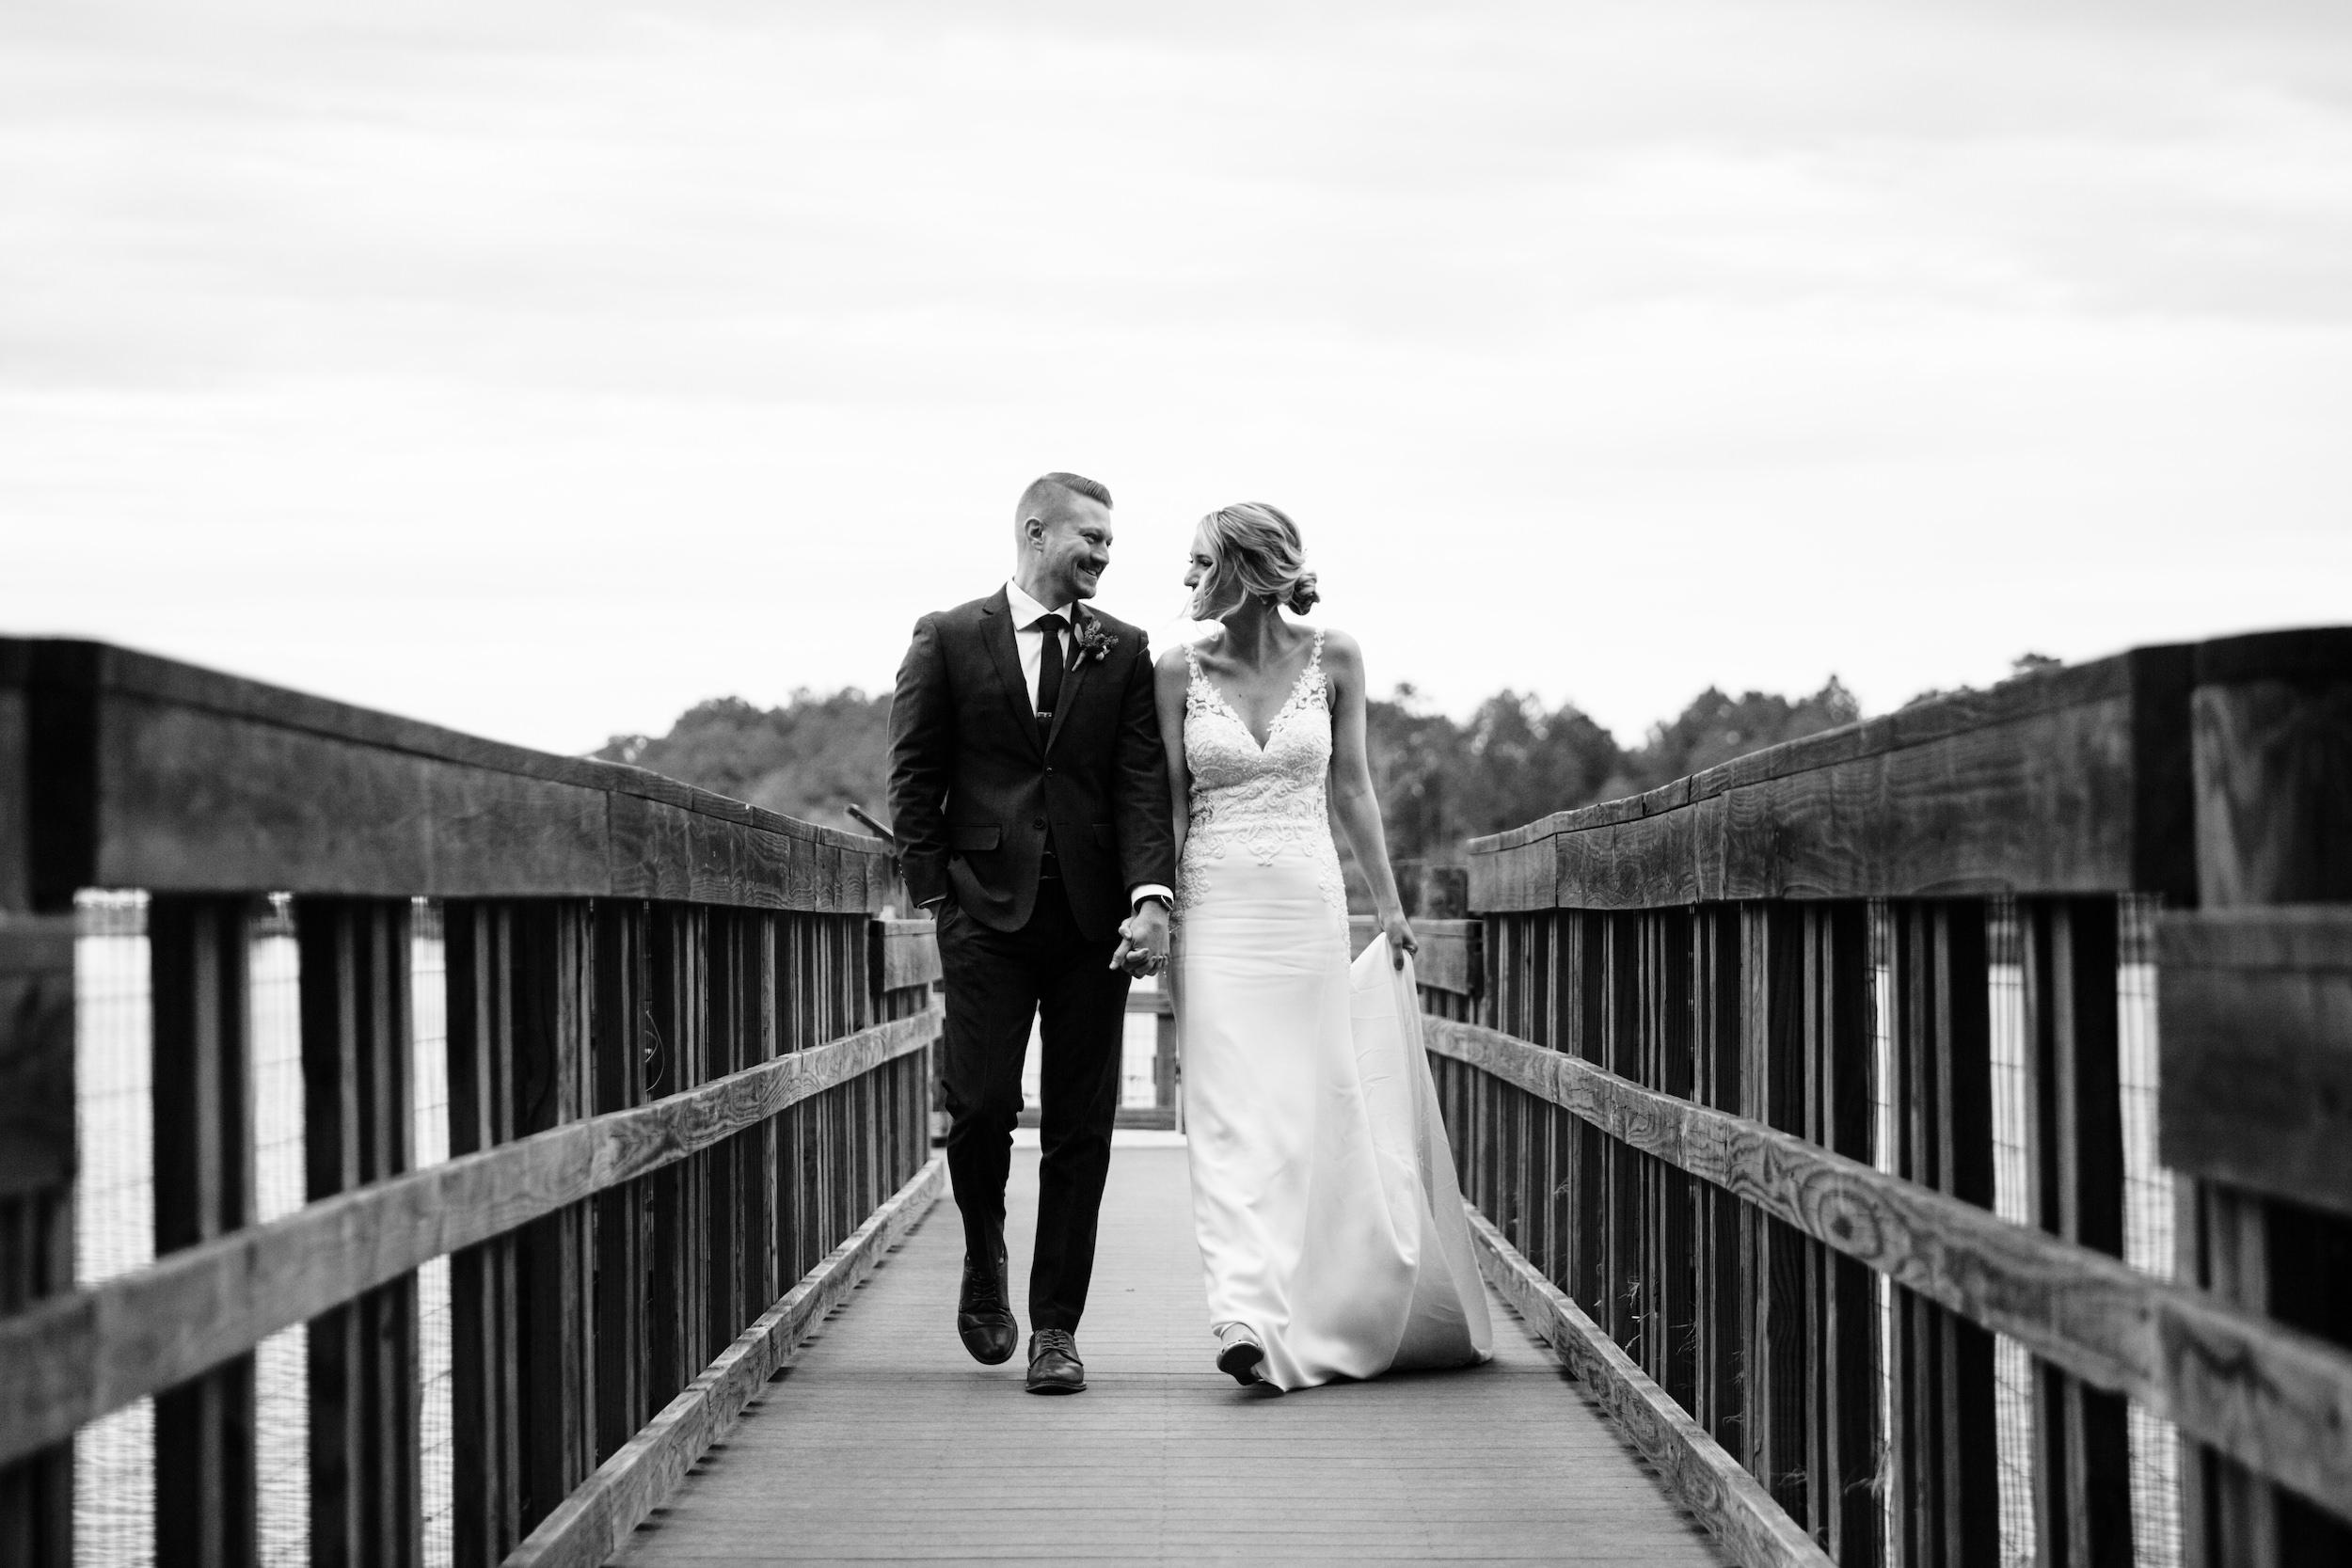 Ricky & Brittney - Pre Ceremony - Jake & Katie Photography_343.jpg